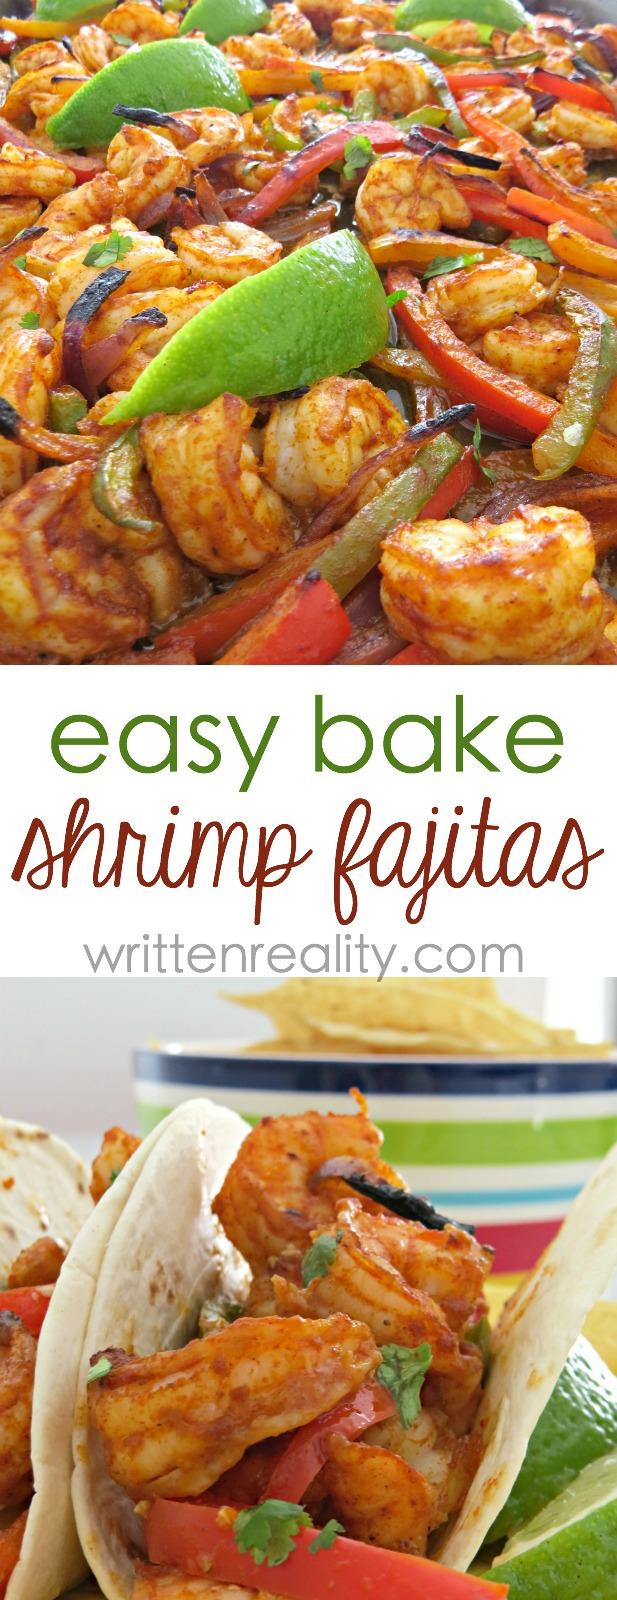 One Sheet Pan Shrimp Fajitas - Written Reality - photo#6